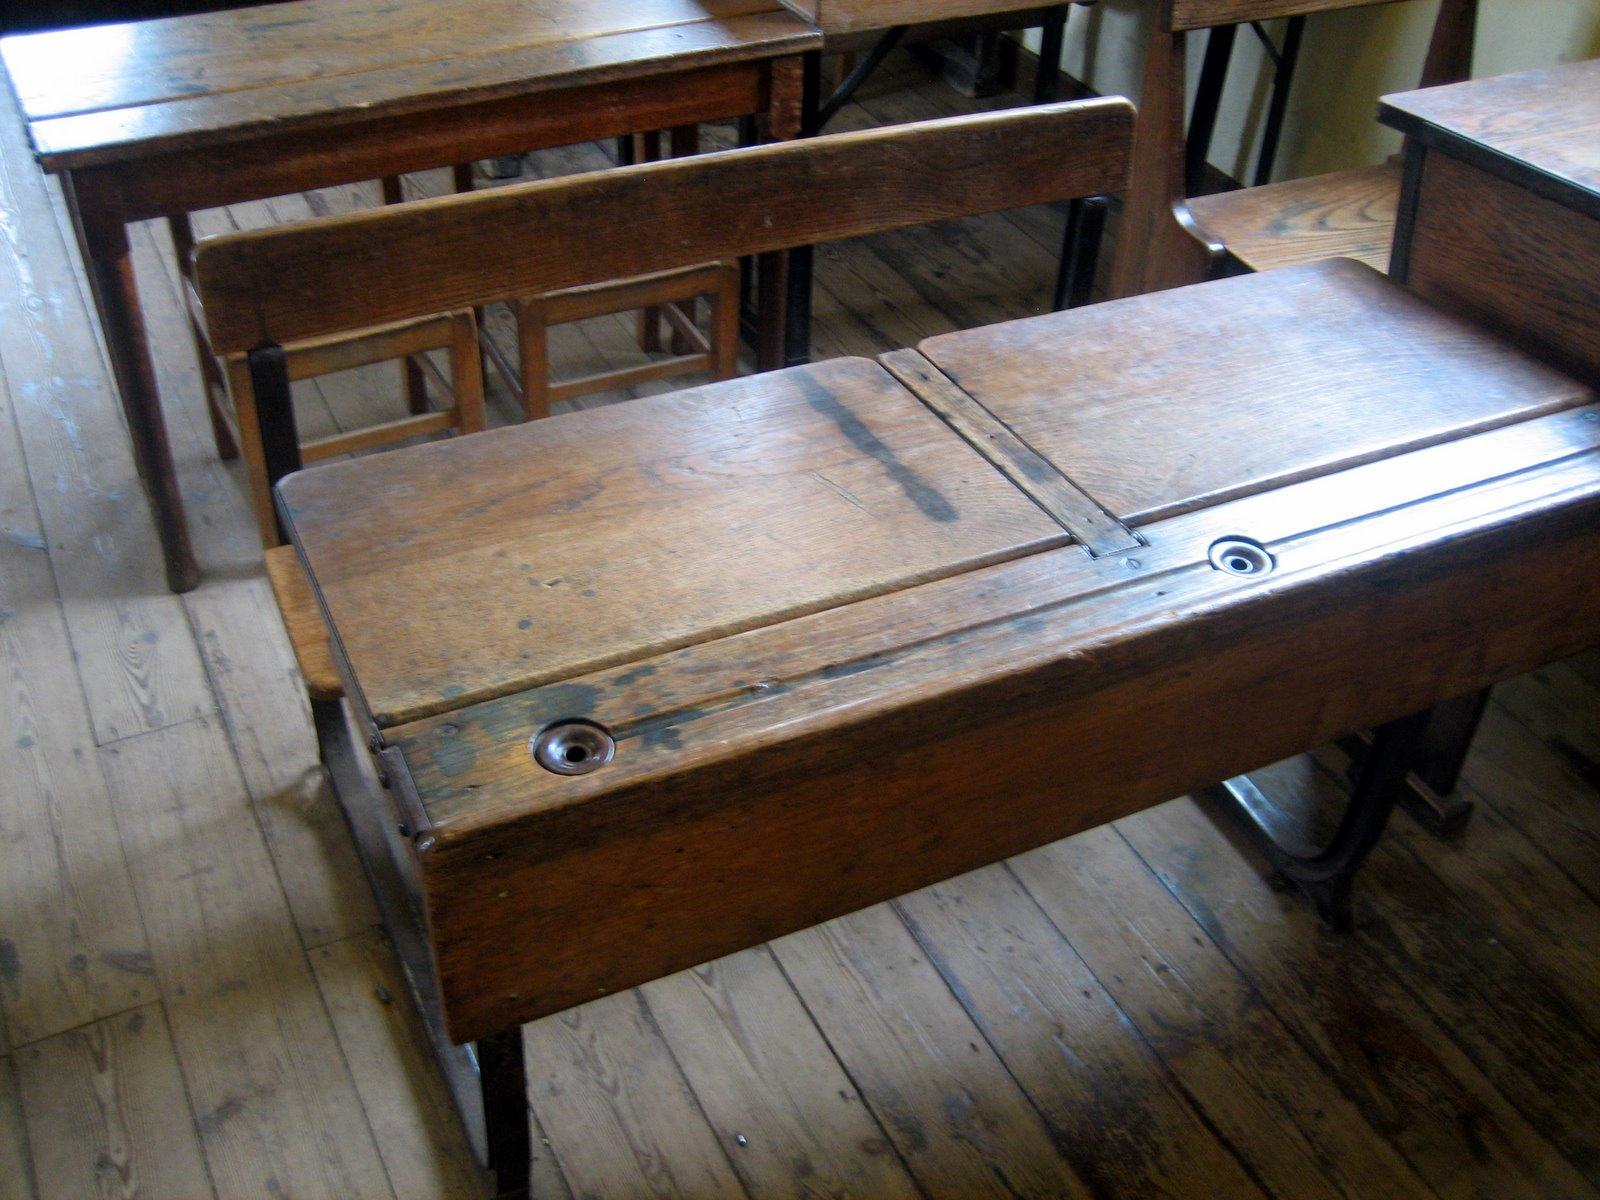 The Old School Desk Gressenhall Norfolk 2017